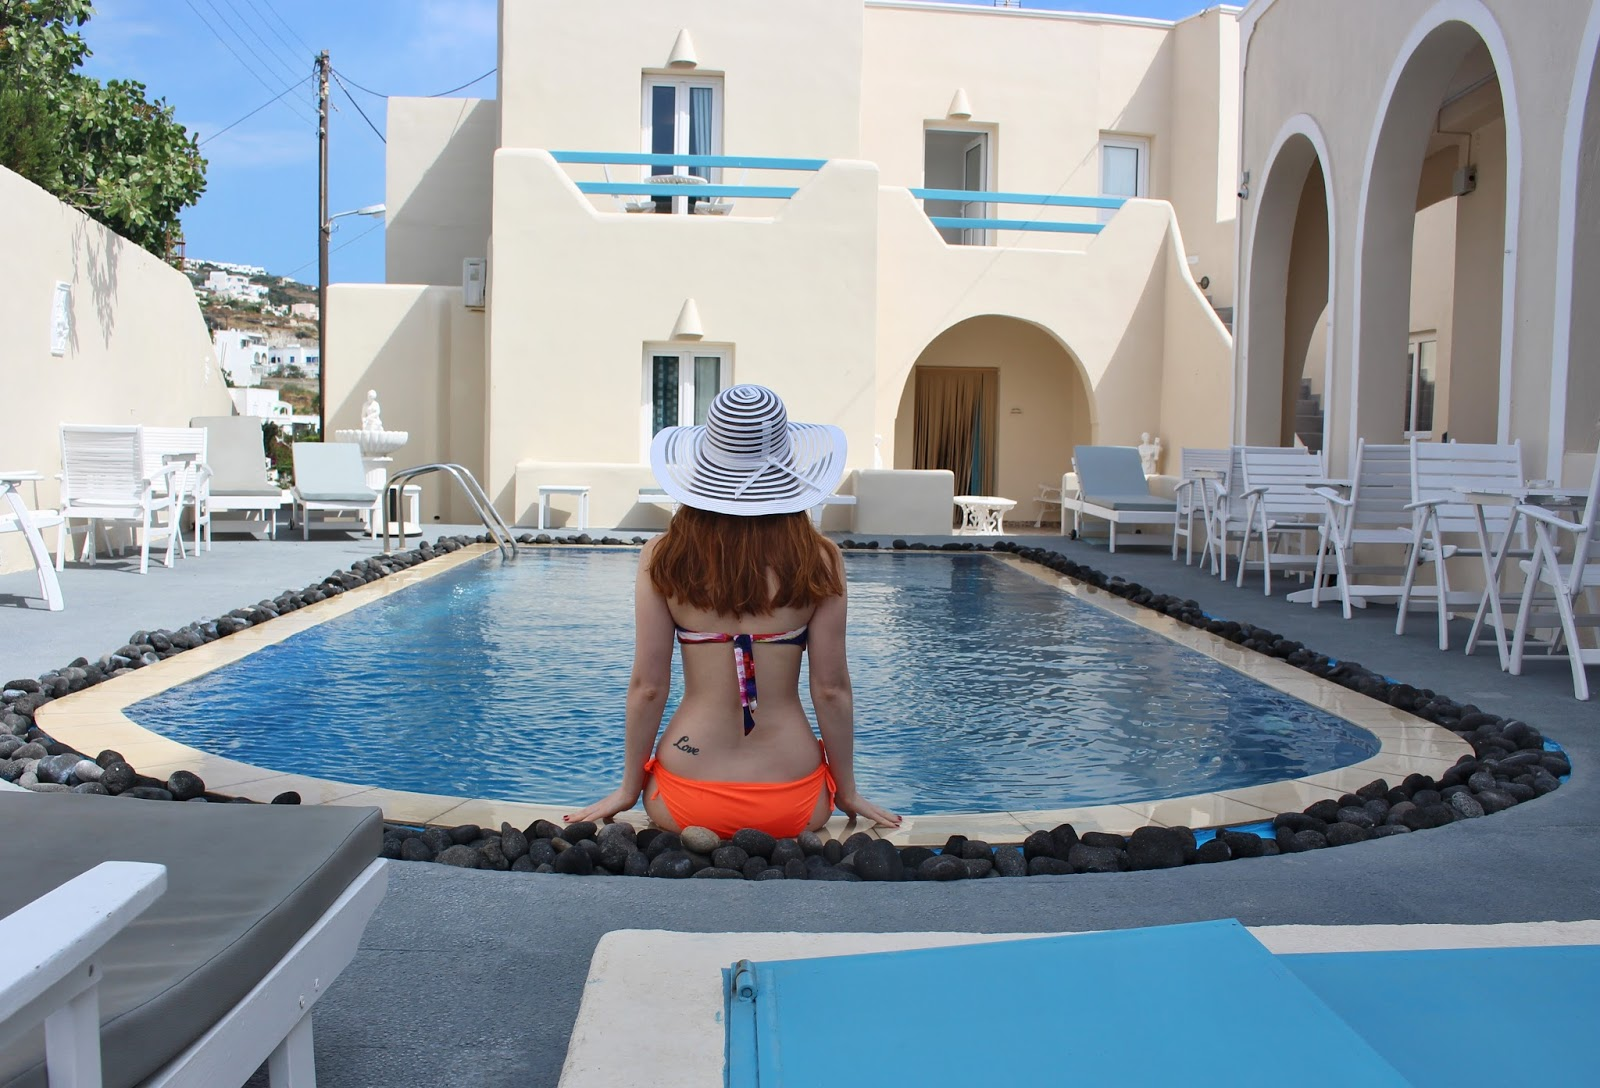 greece, lucie srbová, česká blogerka, blogerka, santorini, rena´s suites